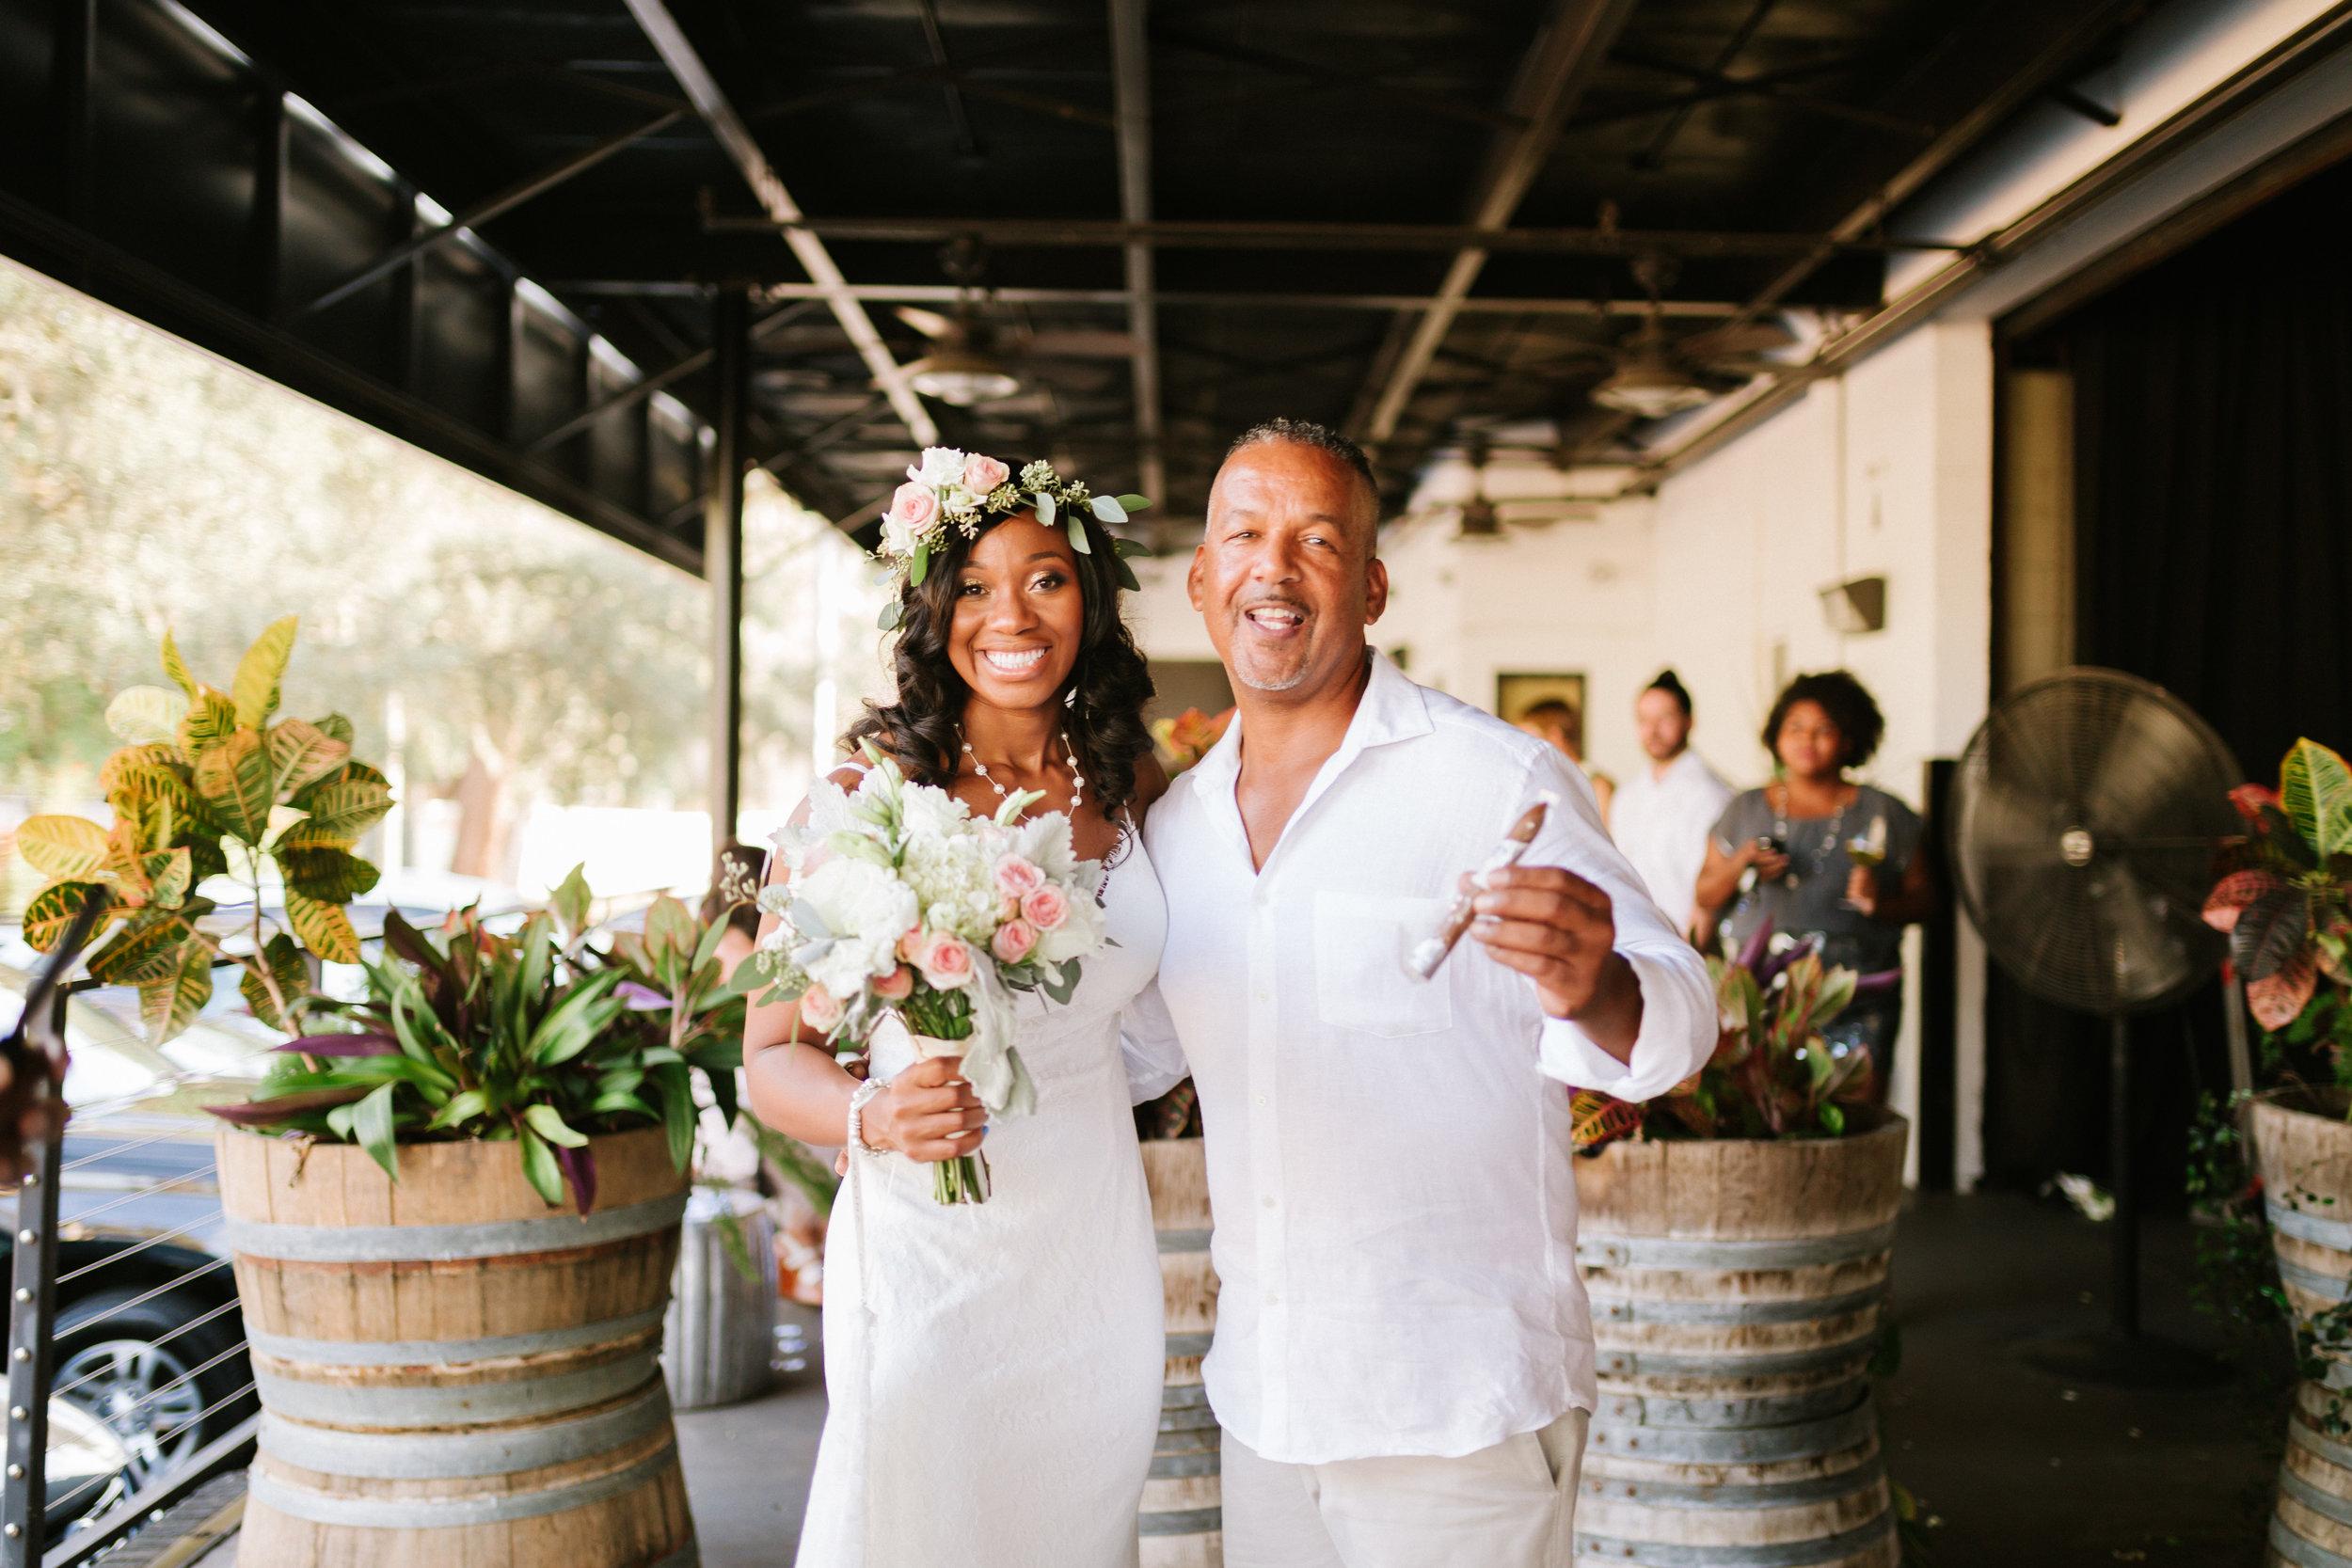 2017.09.16 Ashley and Chuck O'Day Quantam Leap Winery Wedding (276 of 462).jpg